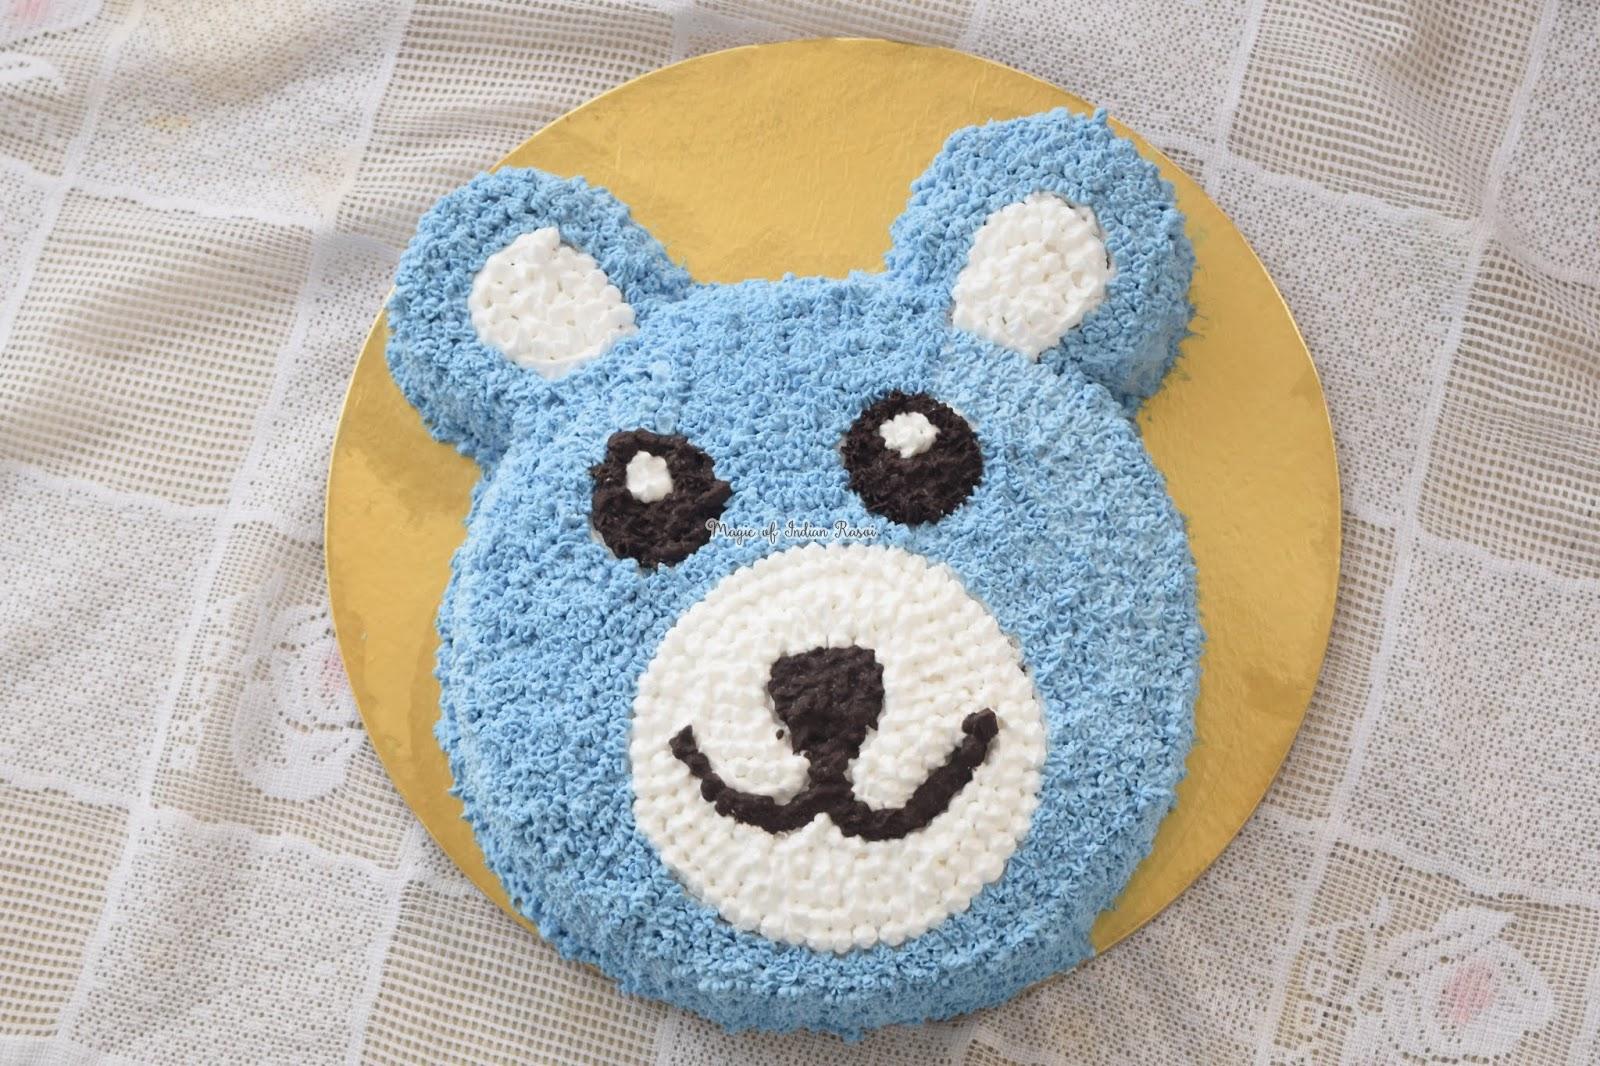 Teddy Bear Cake - Choco Vanilla Whipped Cream Cake Recipe - टेडी बेयर केक घर पर टेडी बेयर केक घर पर बनाने की रेसिपी - Priya R - Magic of Indian Rasoi